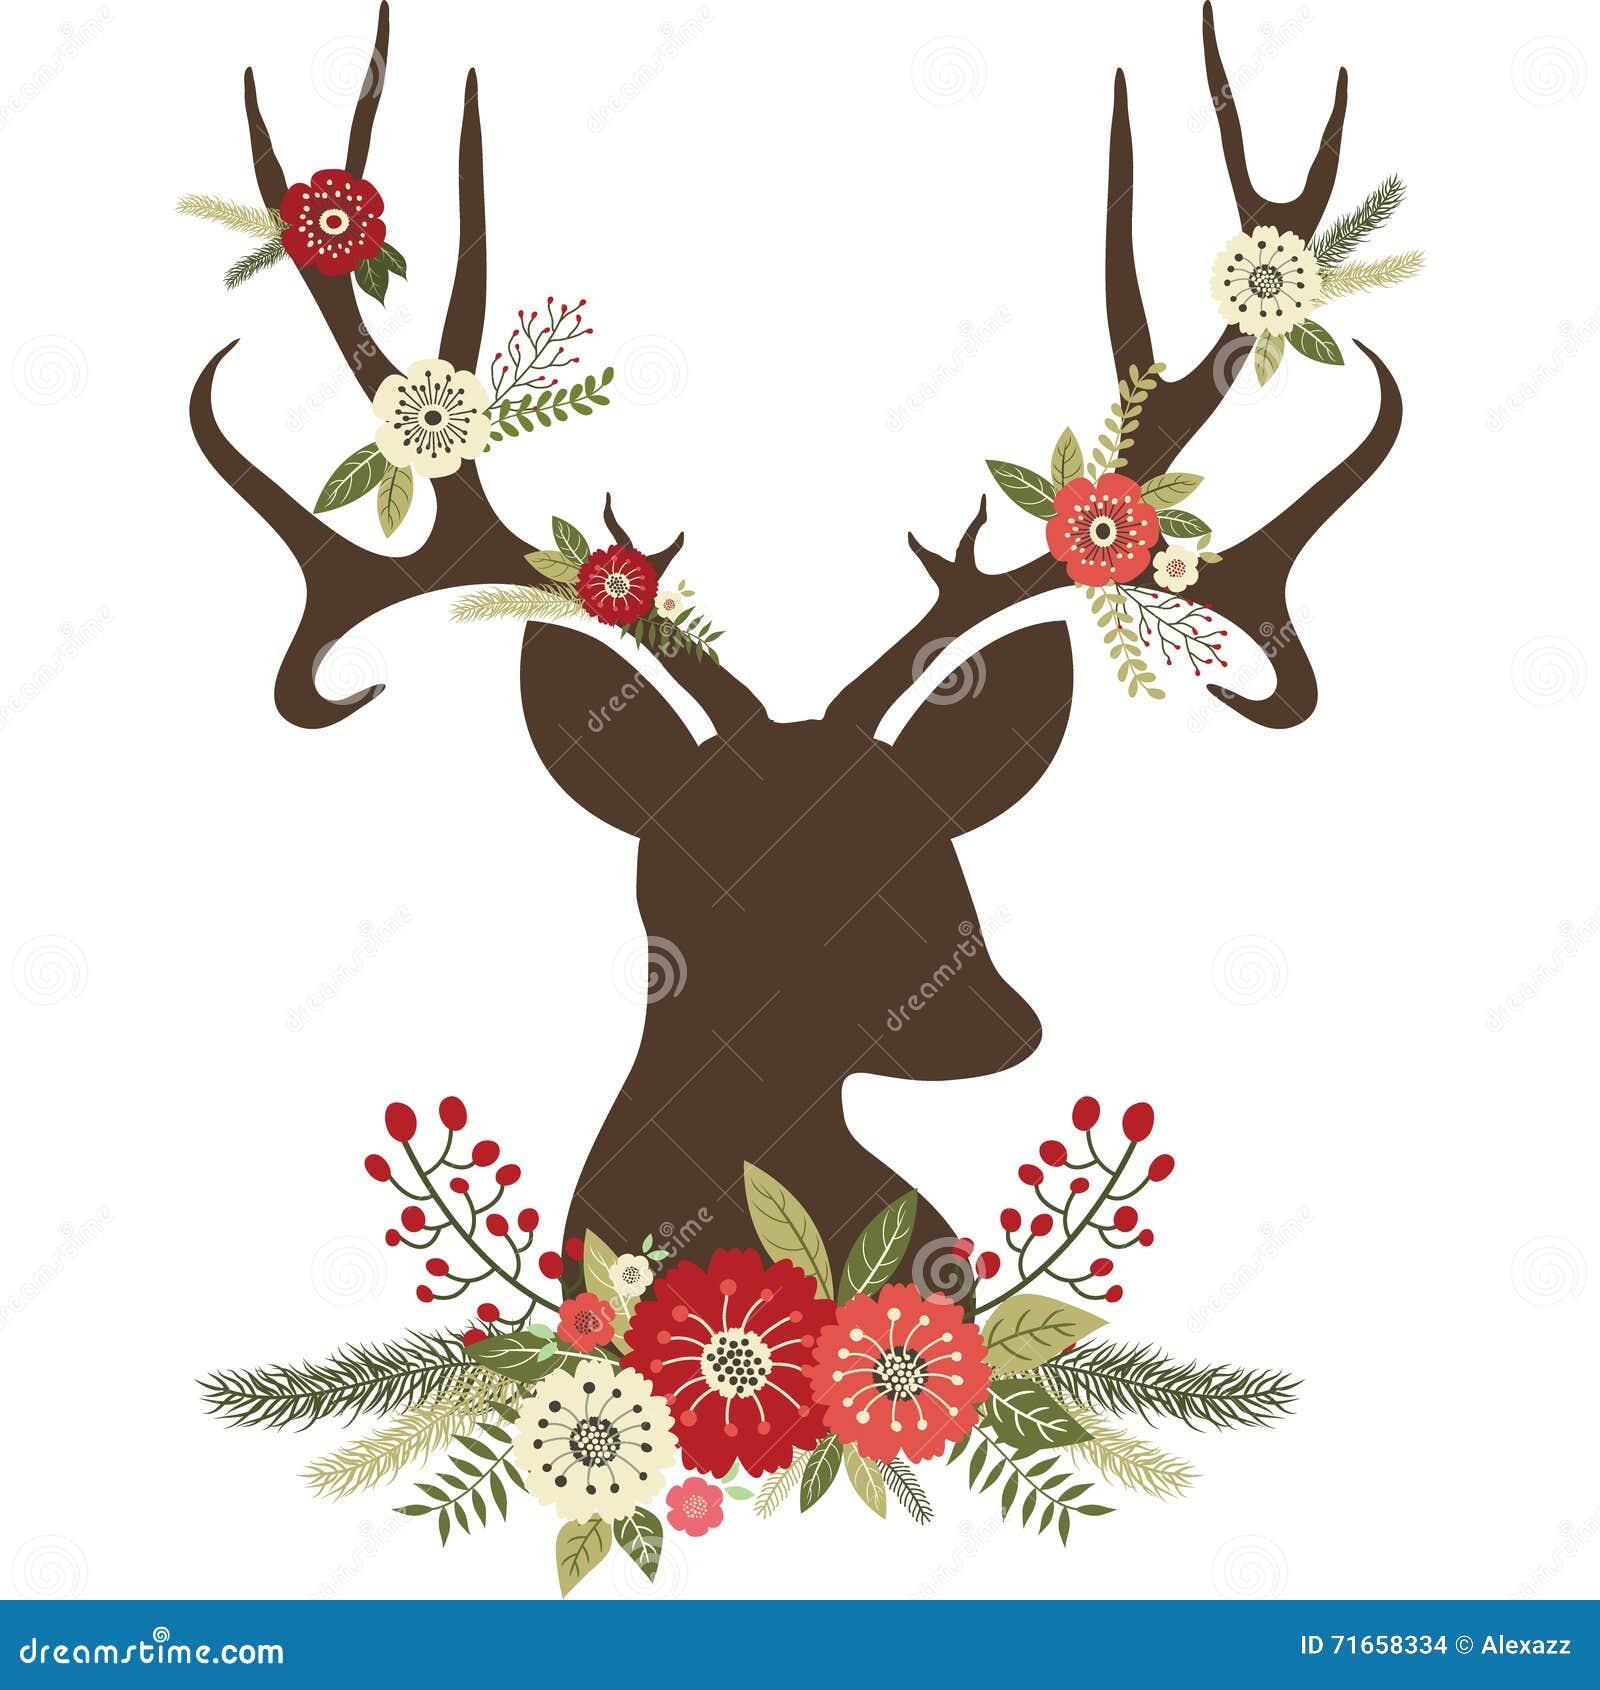 Christmas Deer Antlers With Flowers Stock Vector - Image: 71658334